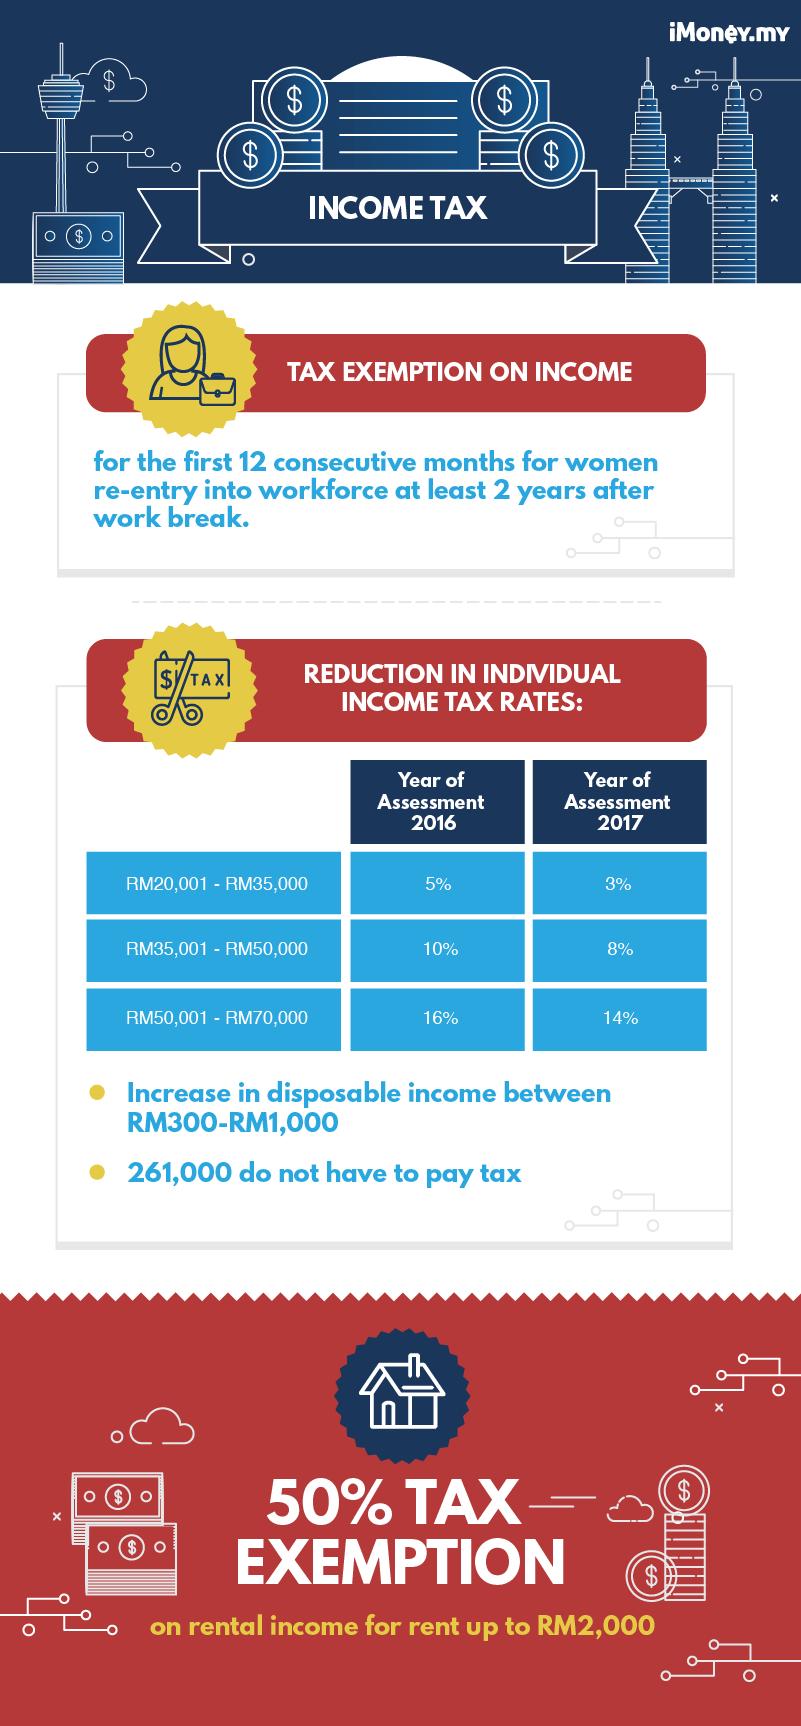 malaysia budget 2018 income tax